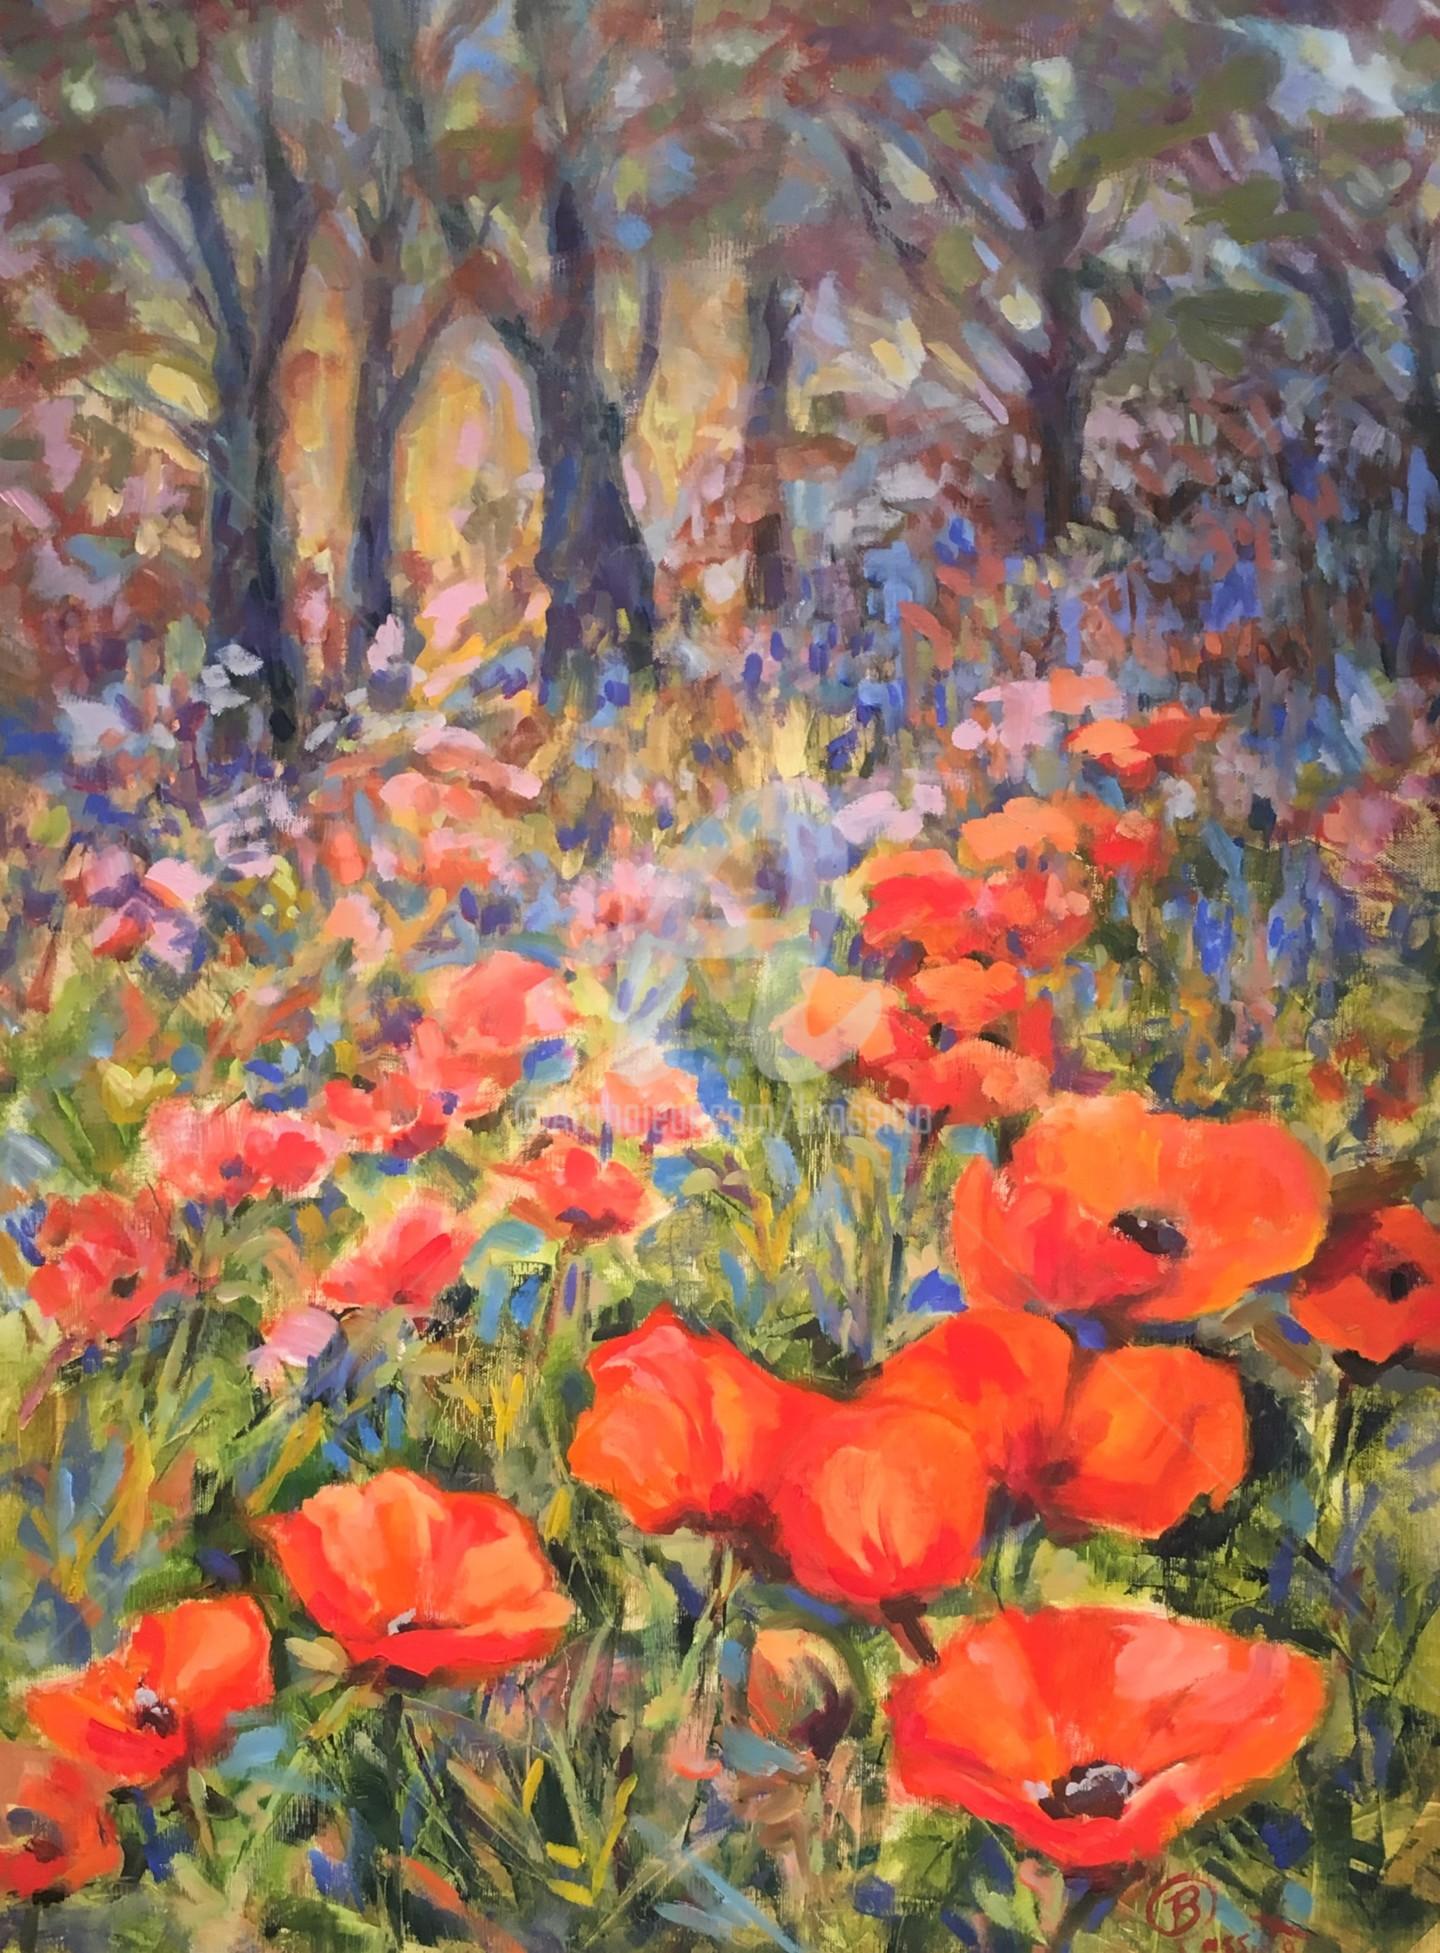 B.Rossitto - Lake Placid Poppies original